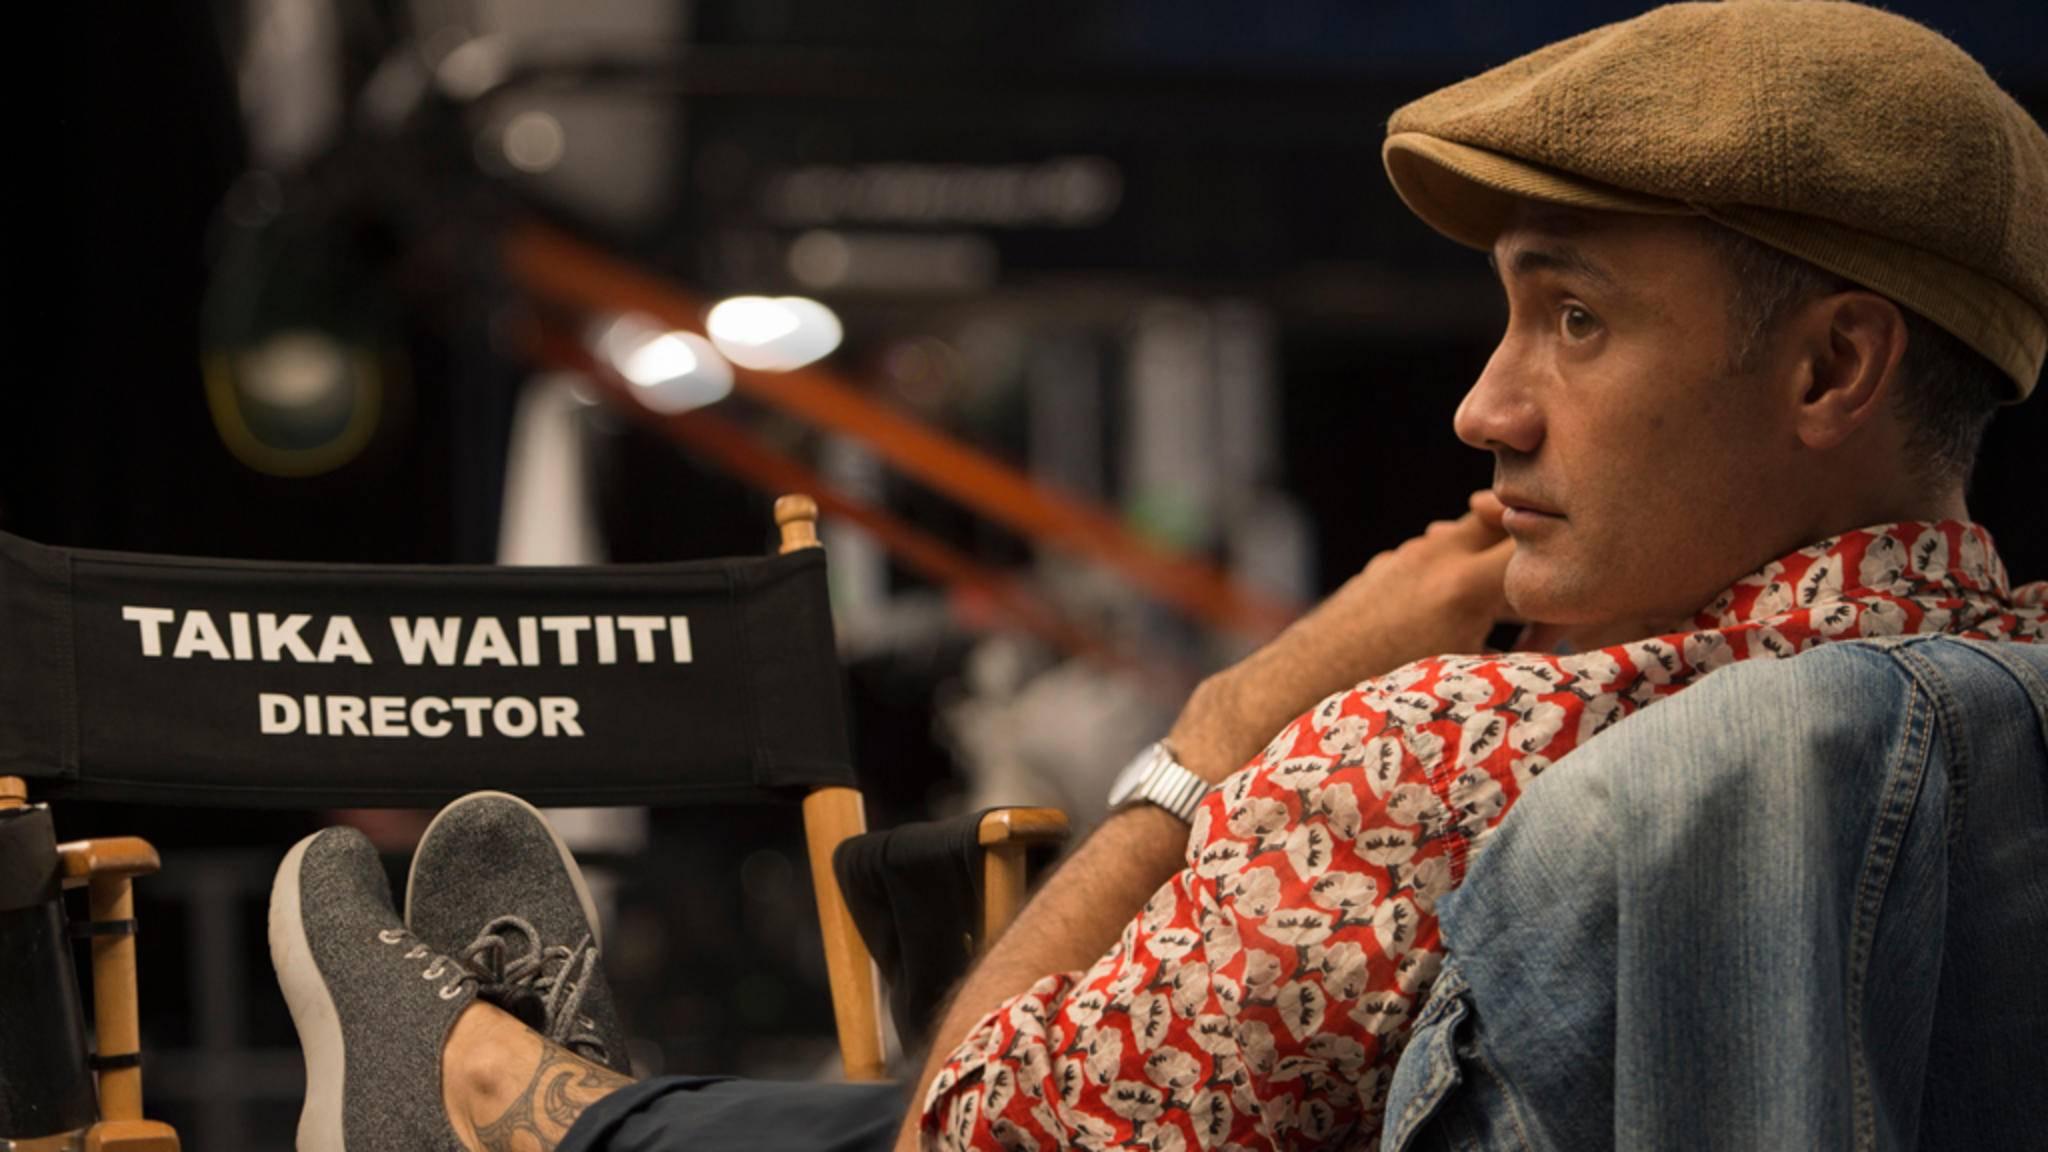 Hollywoods neuer Darling: Regisseur Taika Waititi ist heiß begehrt.